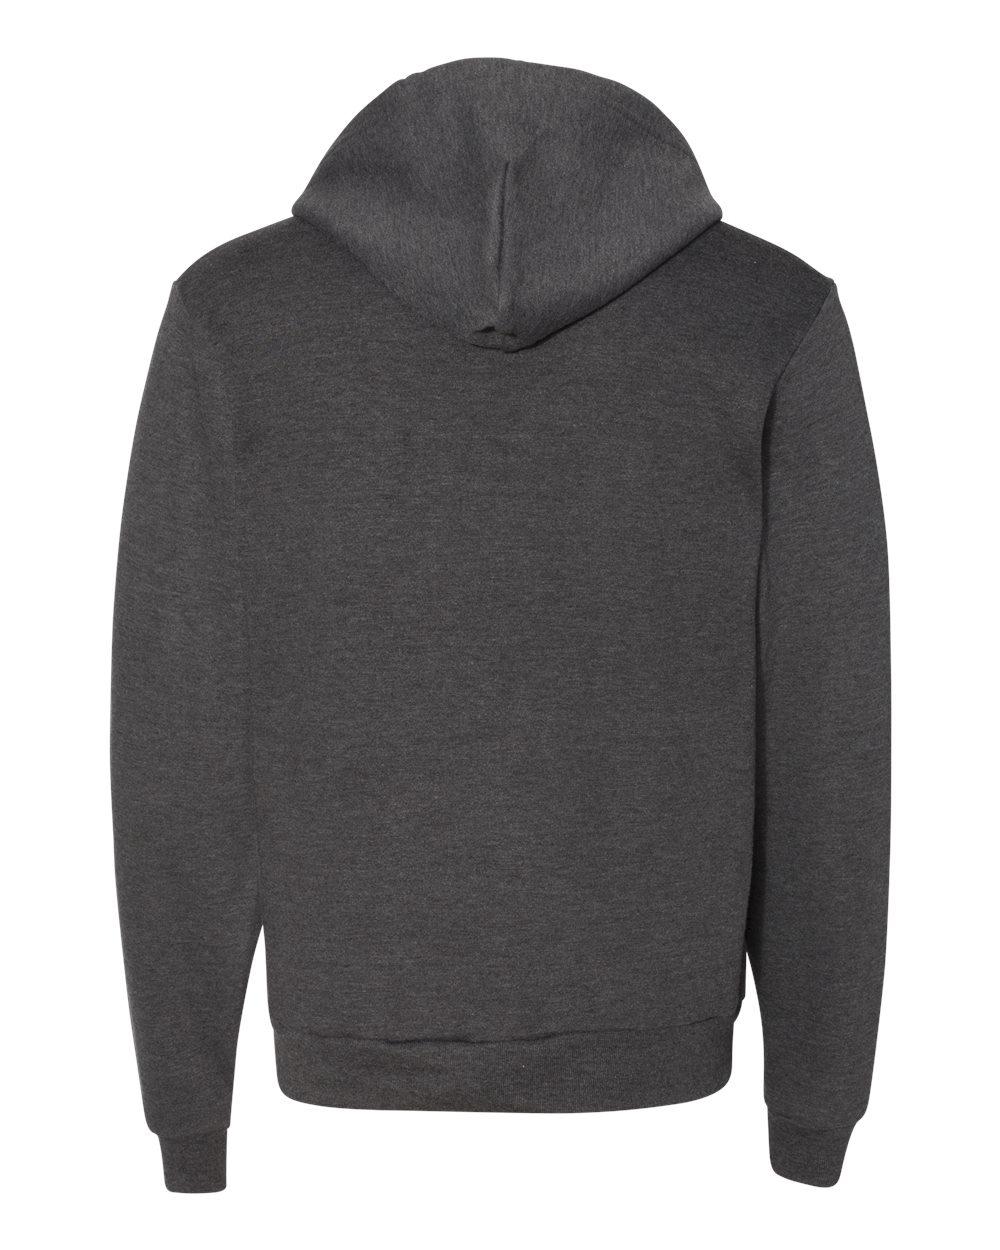 American-Apparel-Flex-Fleece-Unisex-Full-Zip-Hoodie-Blank-F497W-up-to-3XL thumbnail 10